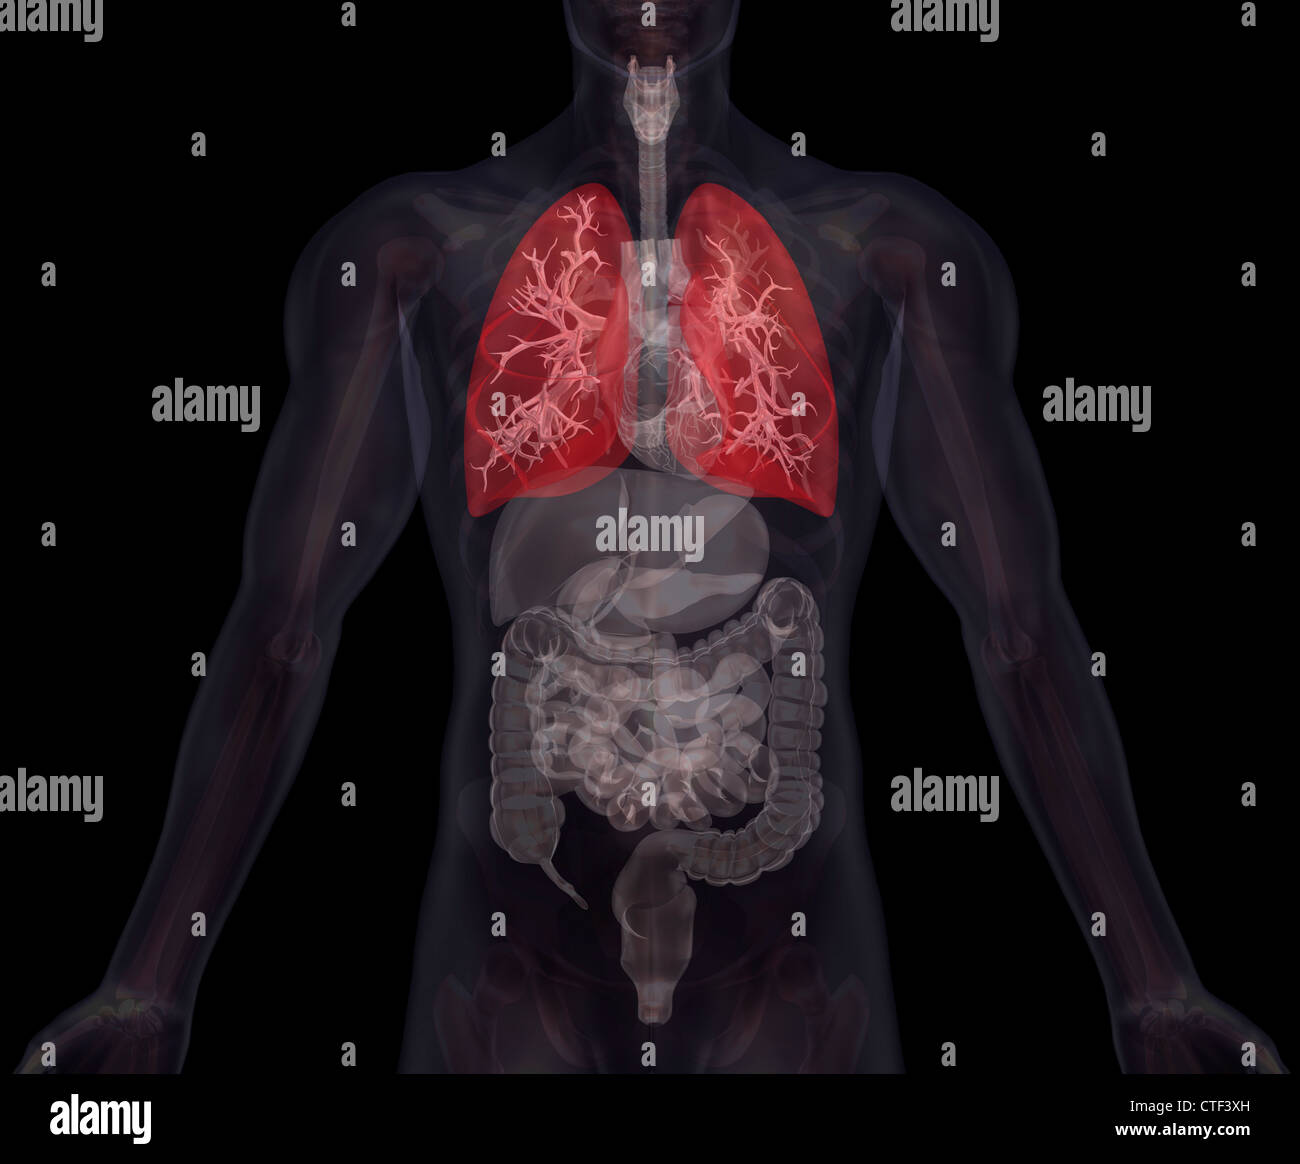 Human Body Illustration Simple Organs Stock Photos & Human Body ...